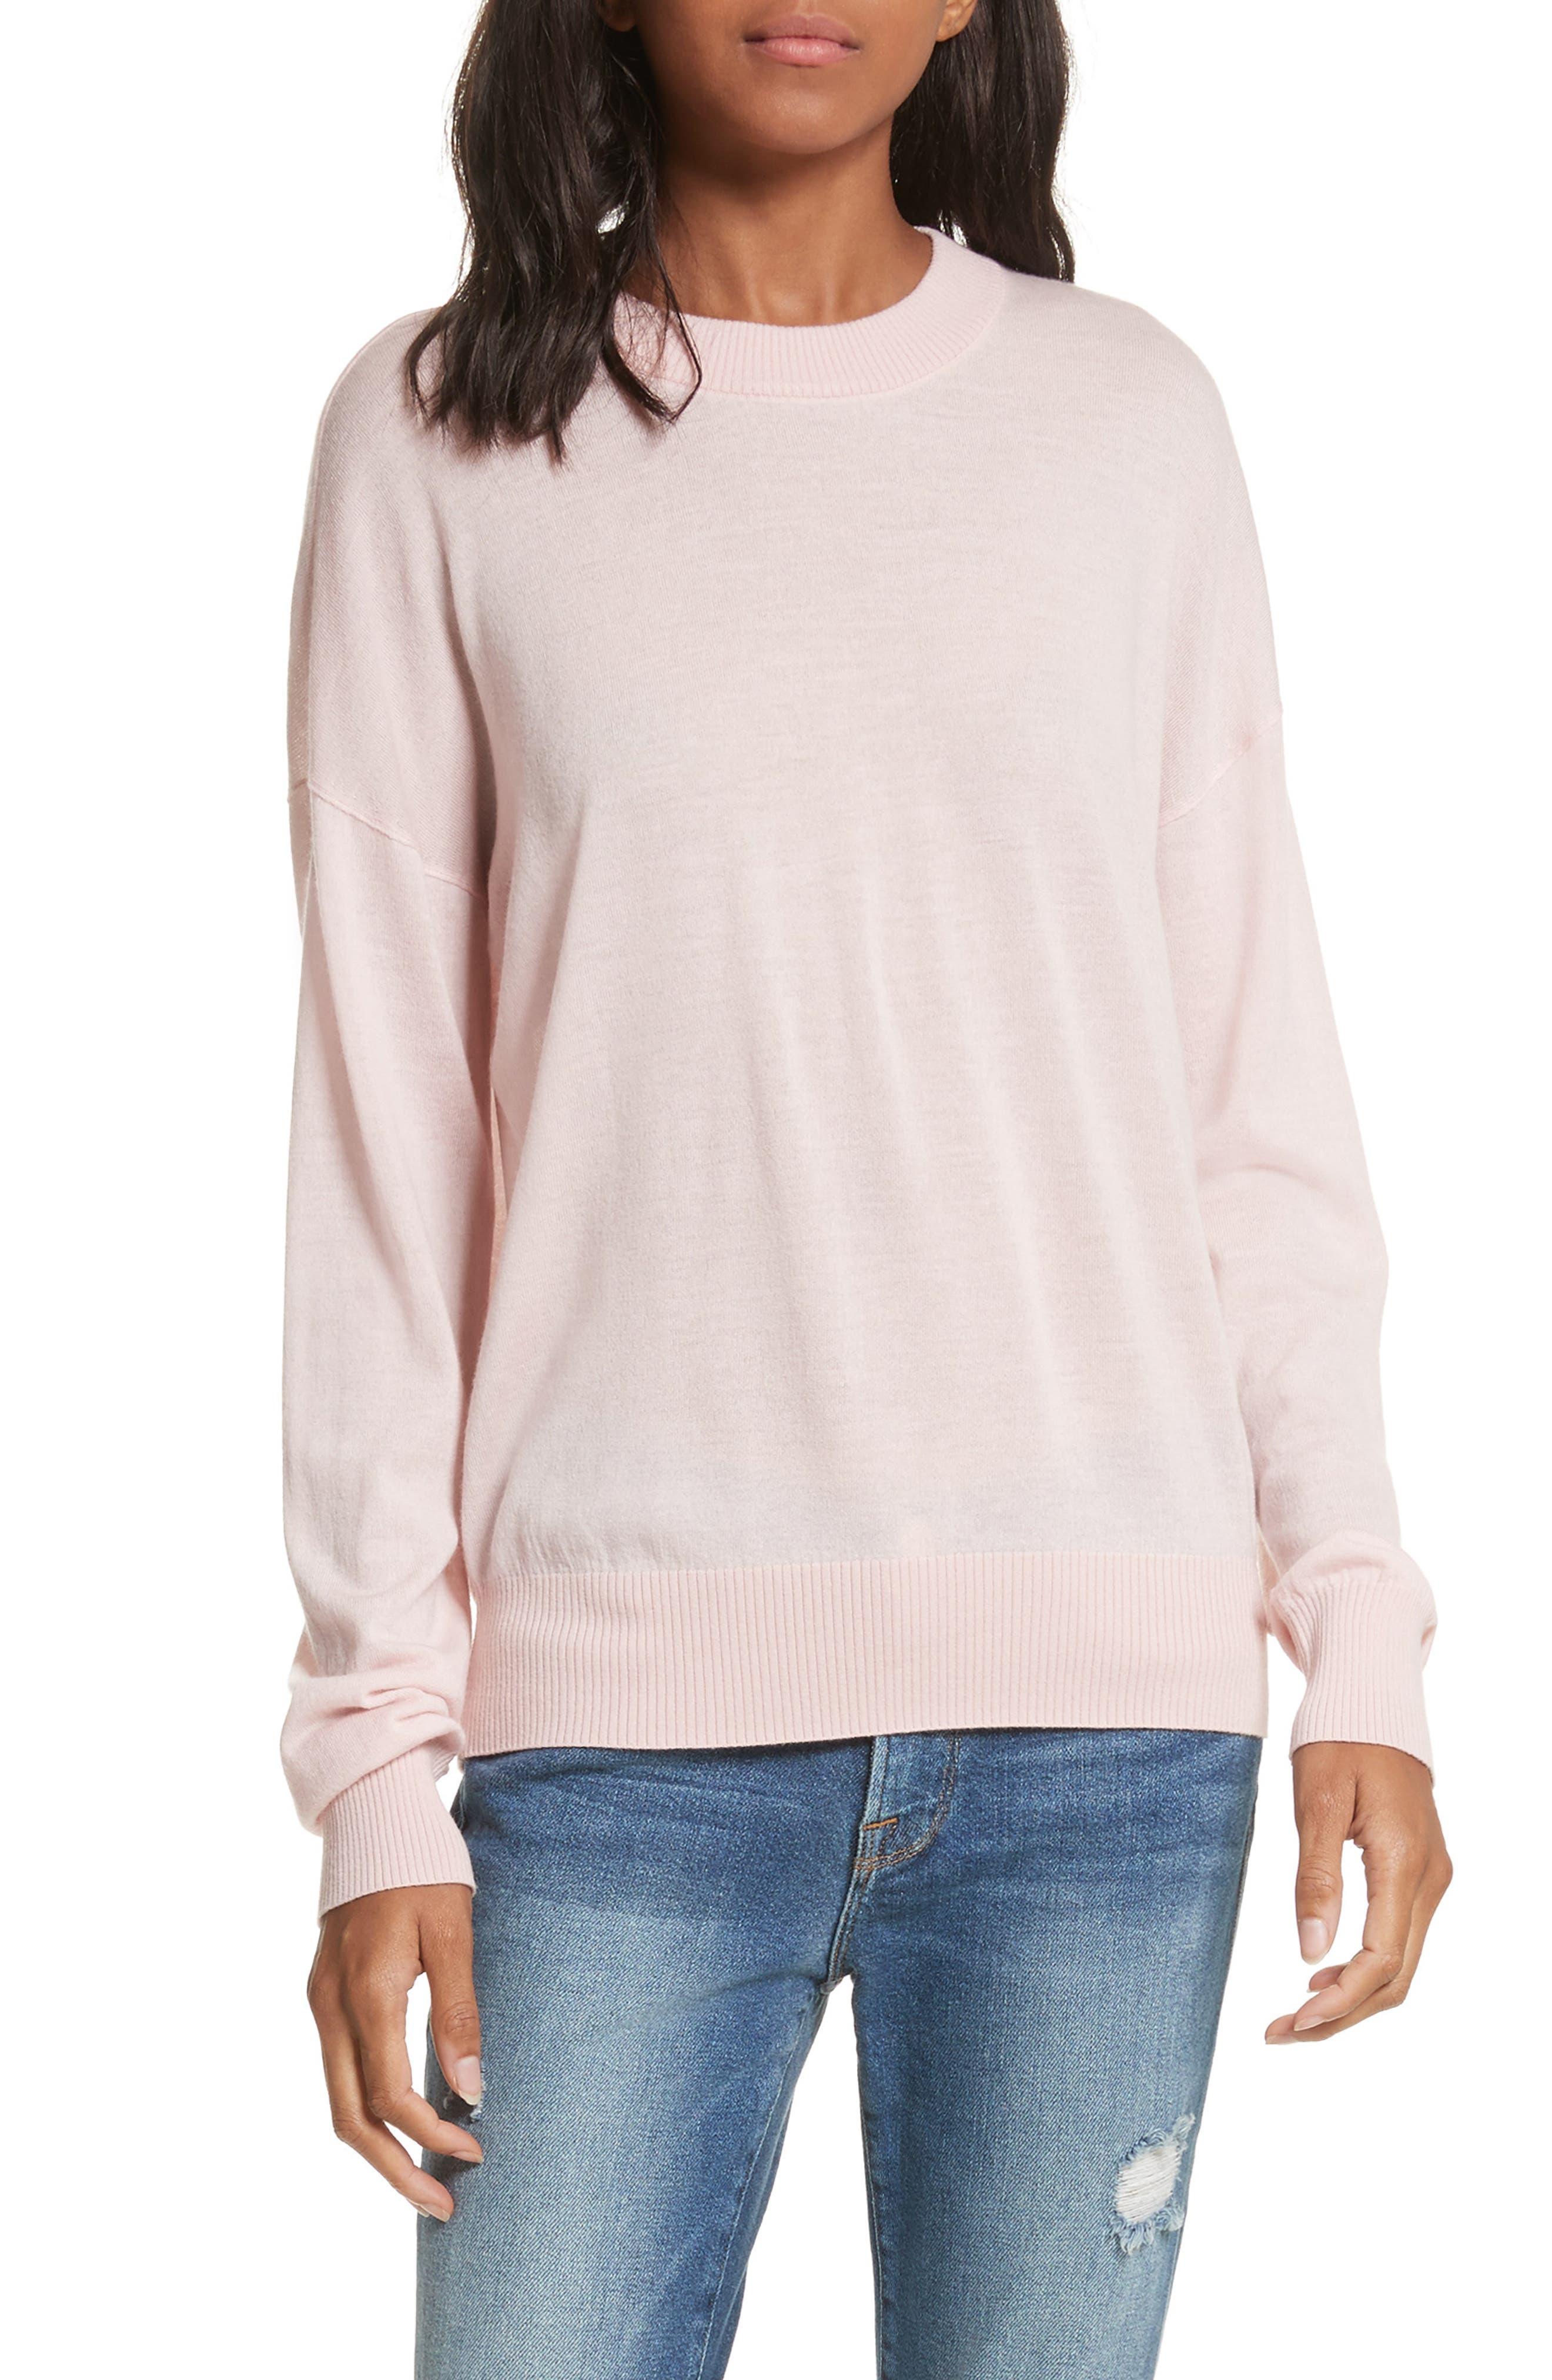 Frame Denim True Crewneck Wool Sweater